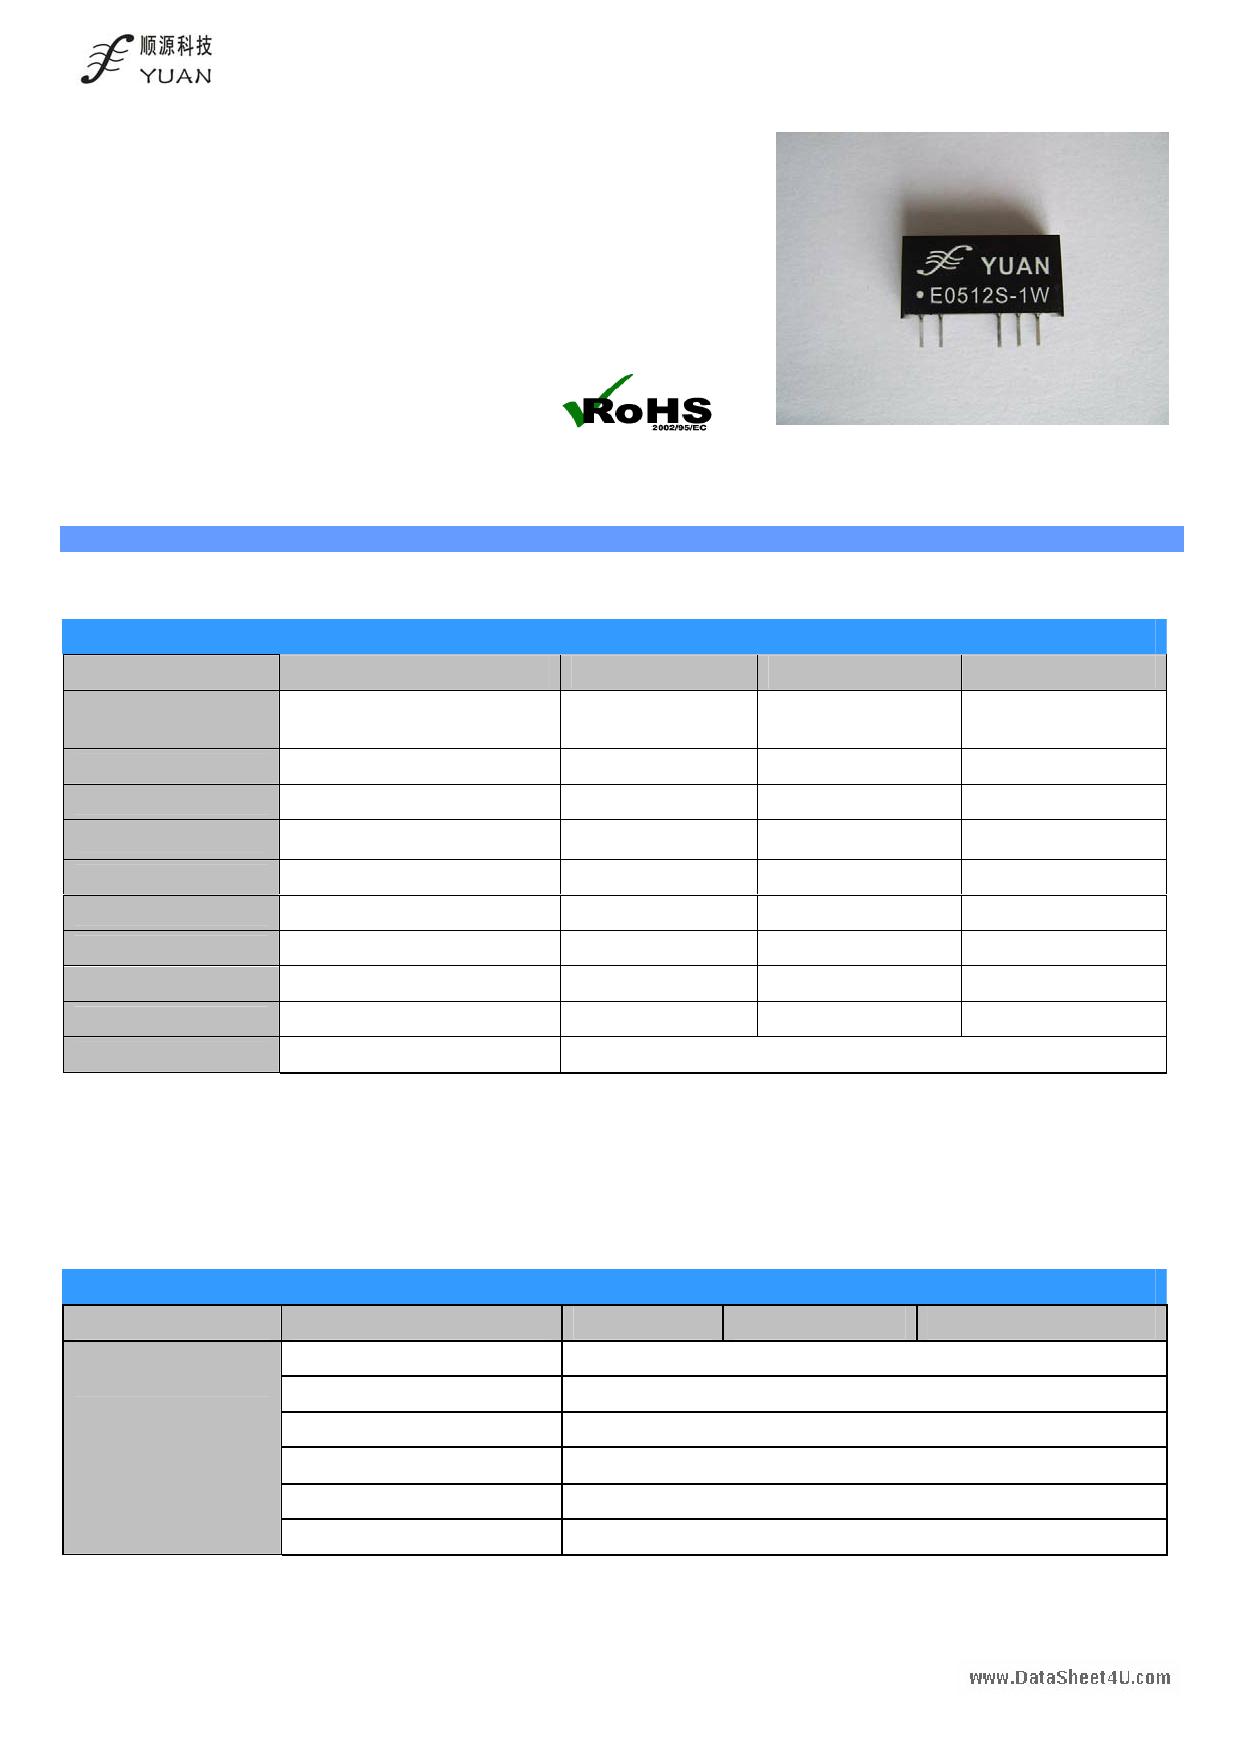 E12xxS-1W دیتاشیت PDF